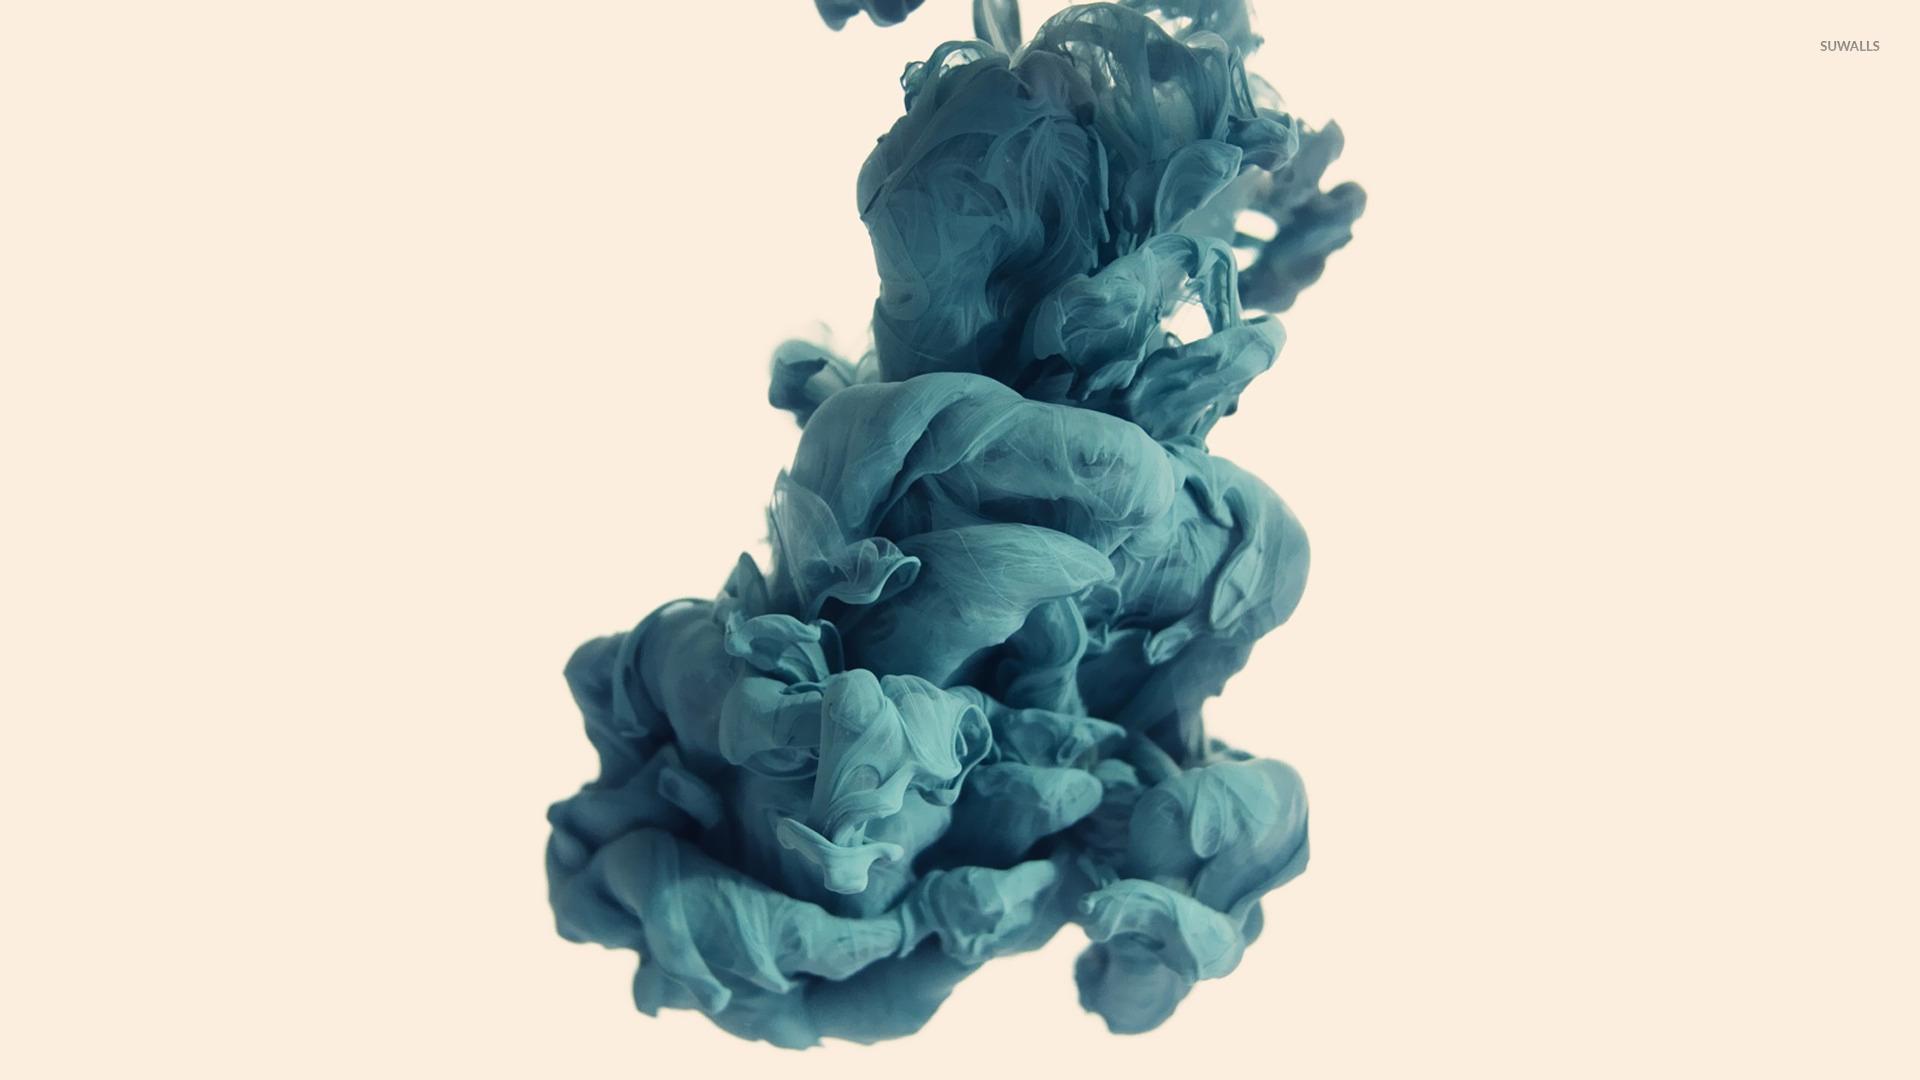 smoke wallpaper - abstract wallpapers - #15648